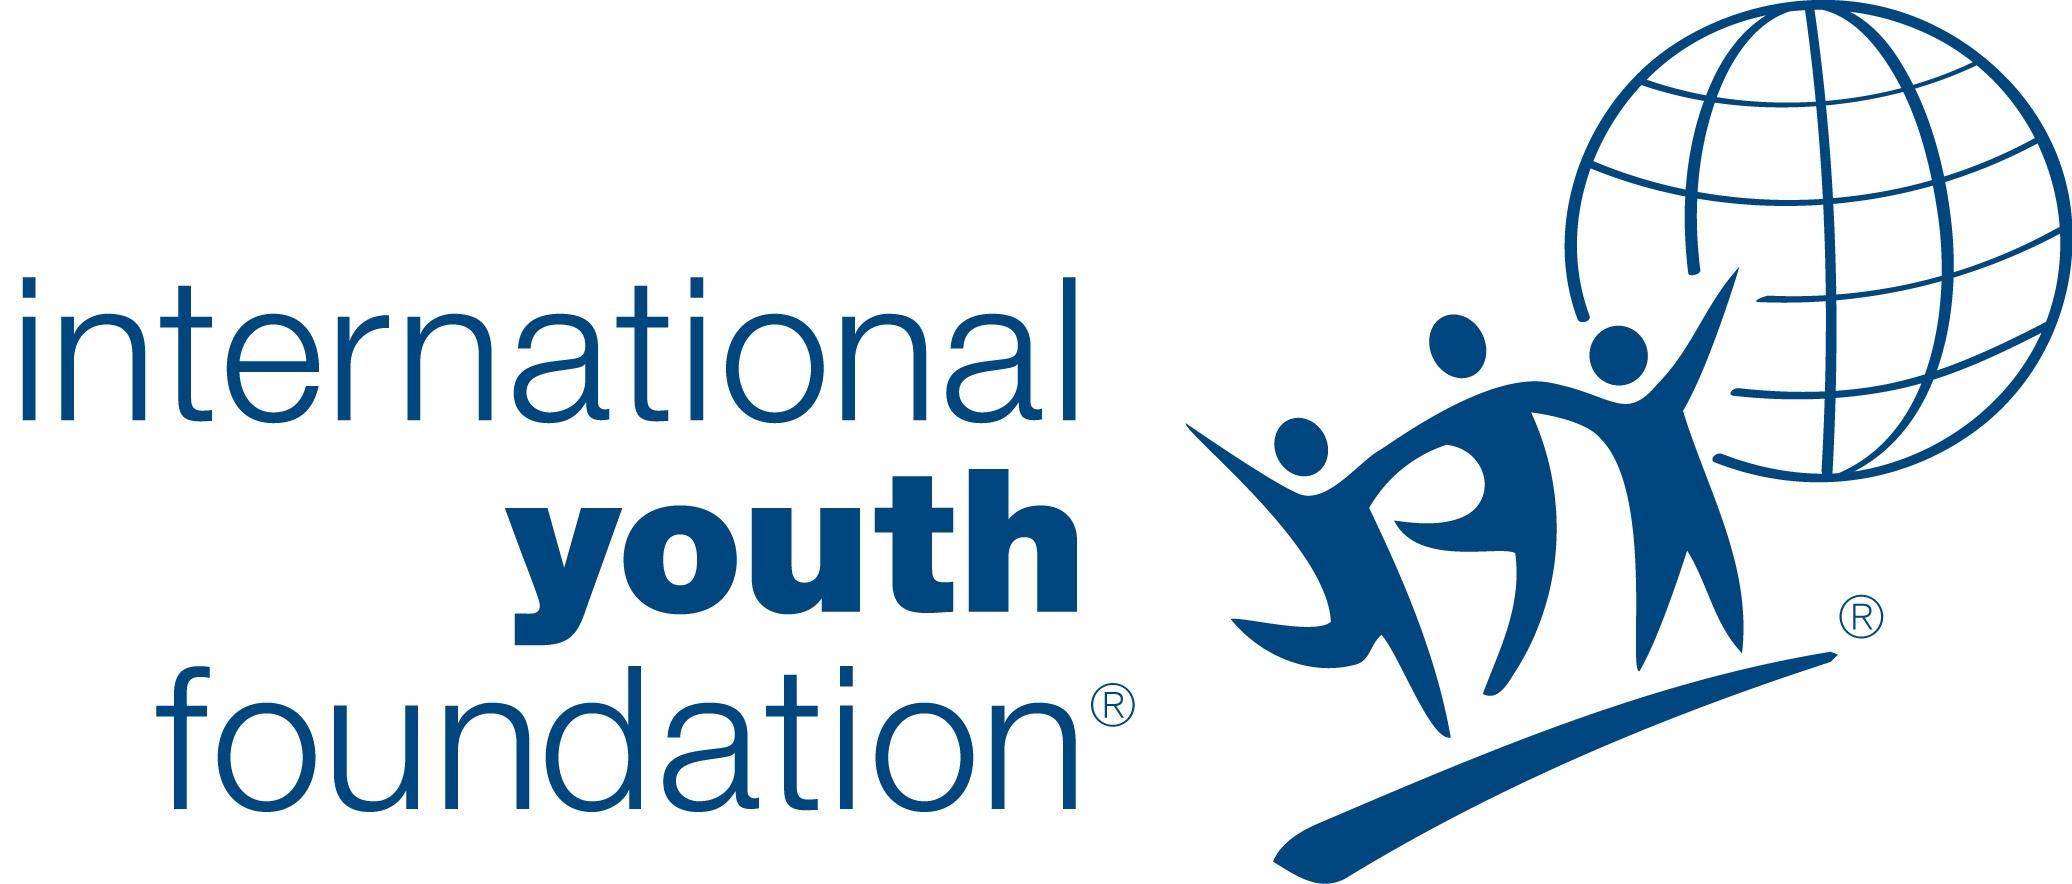 Resultado de imagen de international youth foundation